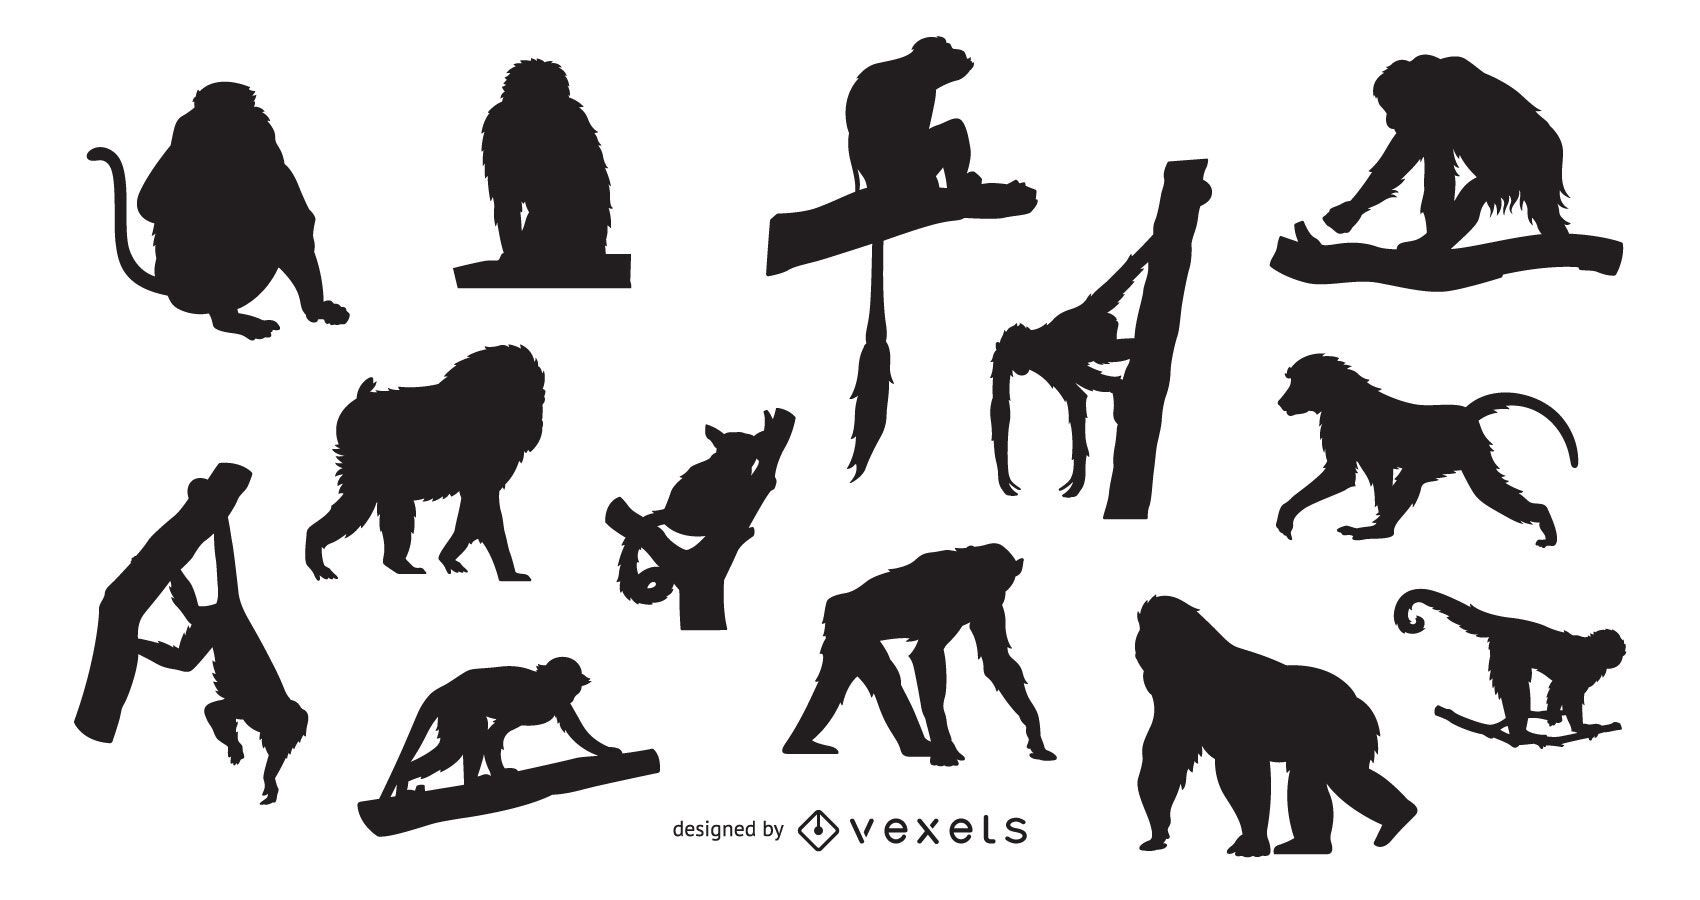 Monkey silhouette set design